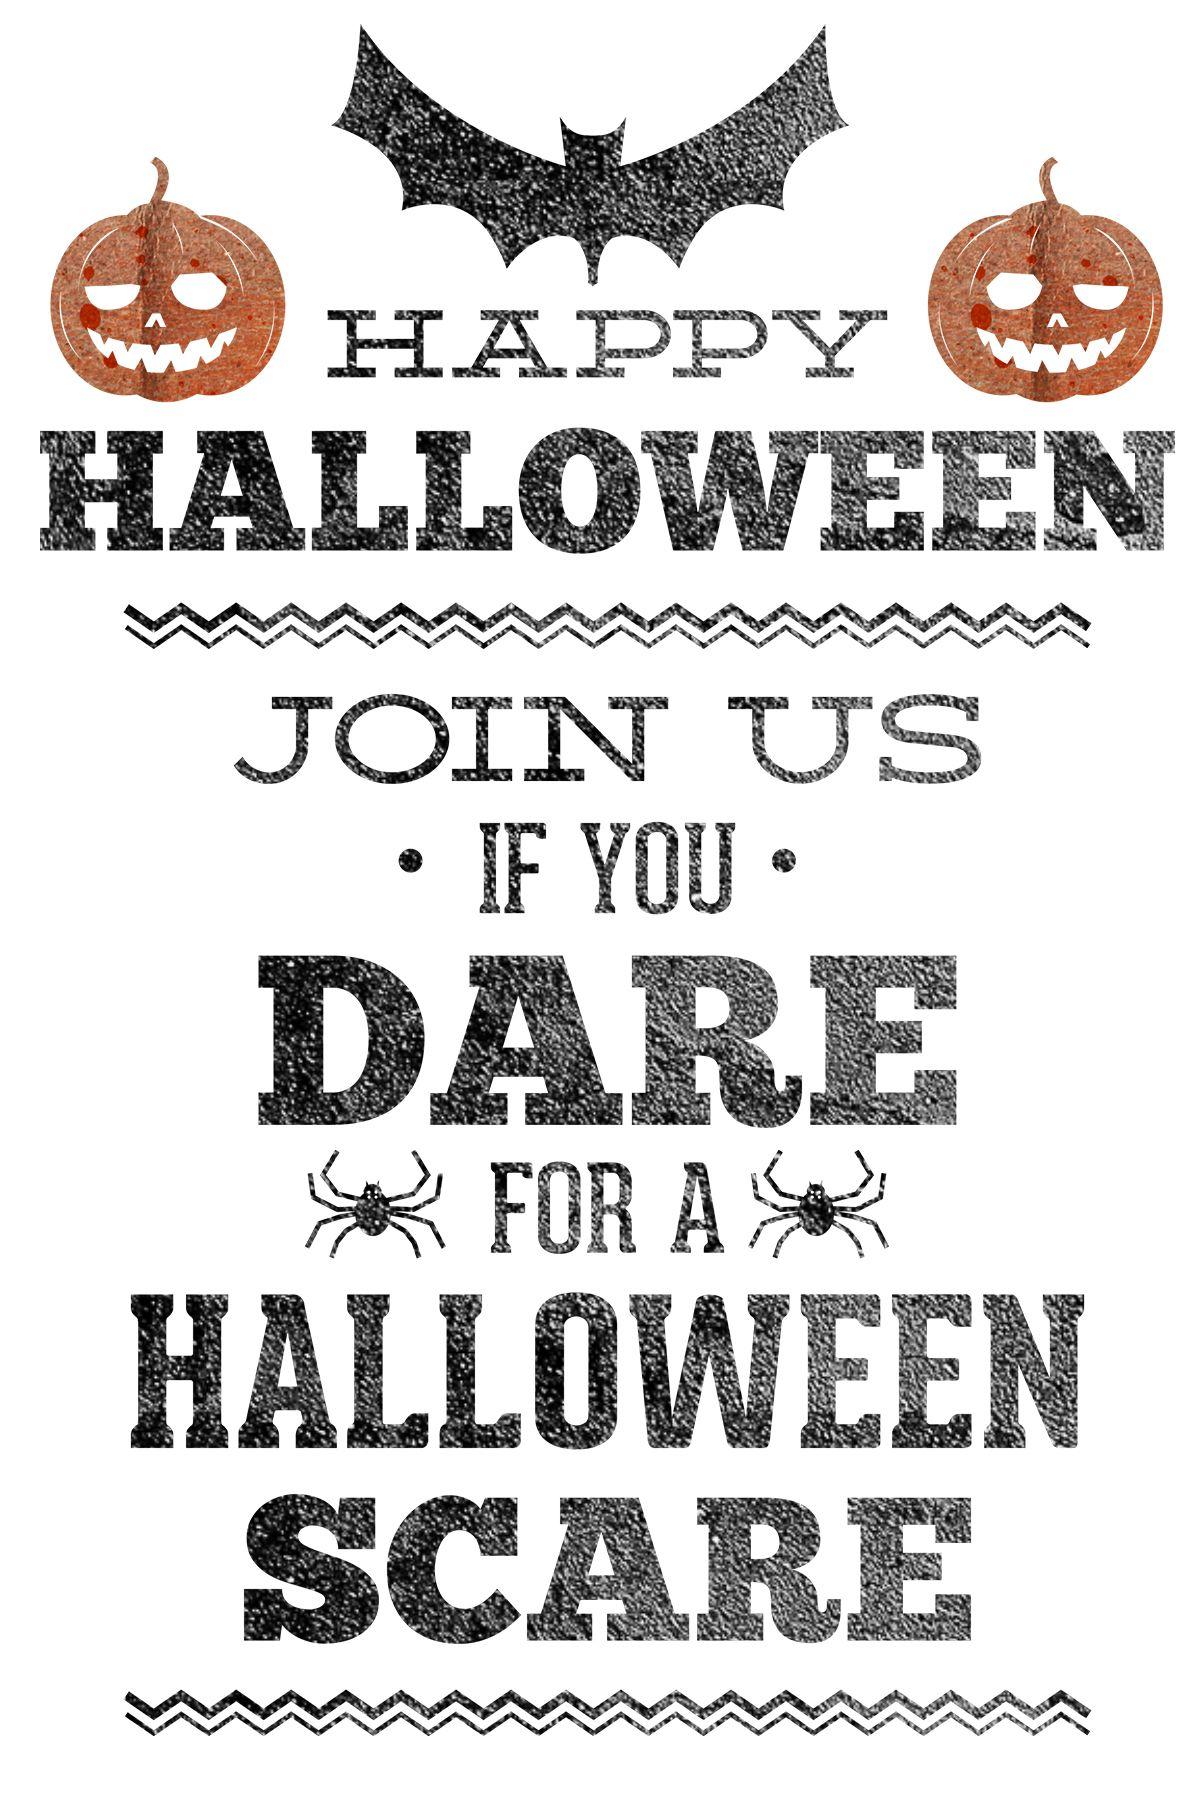 Free Printable Halloween Party Invitation The Gra Halloween Party Invitation Template Free Halloween Party Invitations Printable Halloween Party Invitations